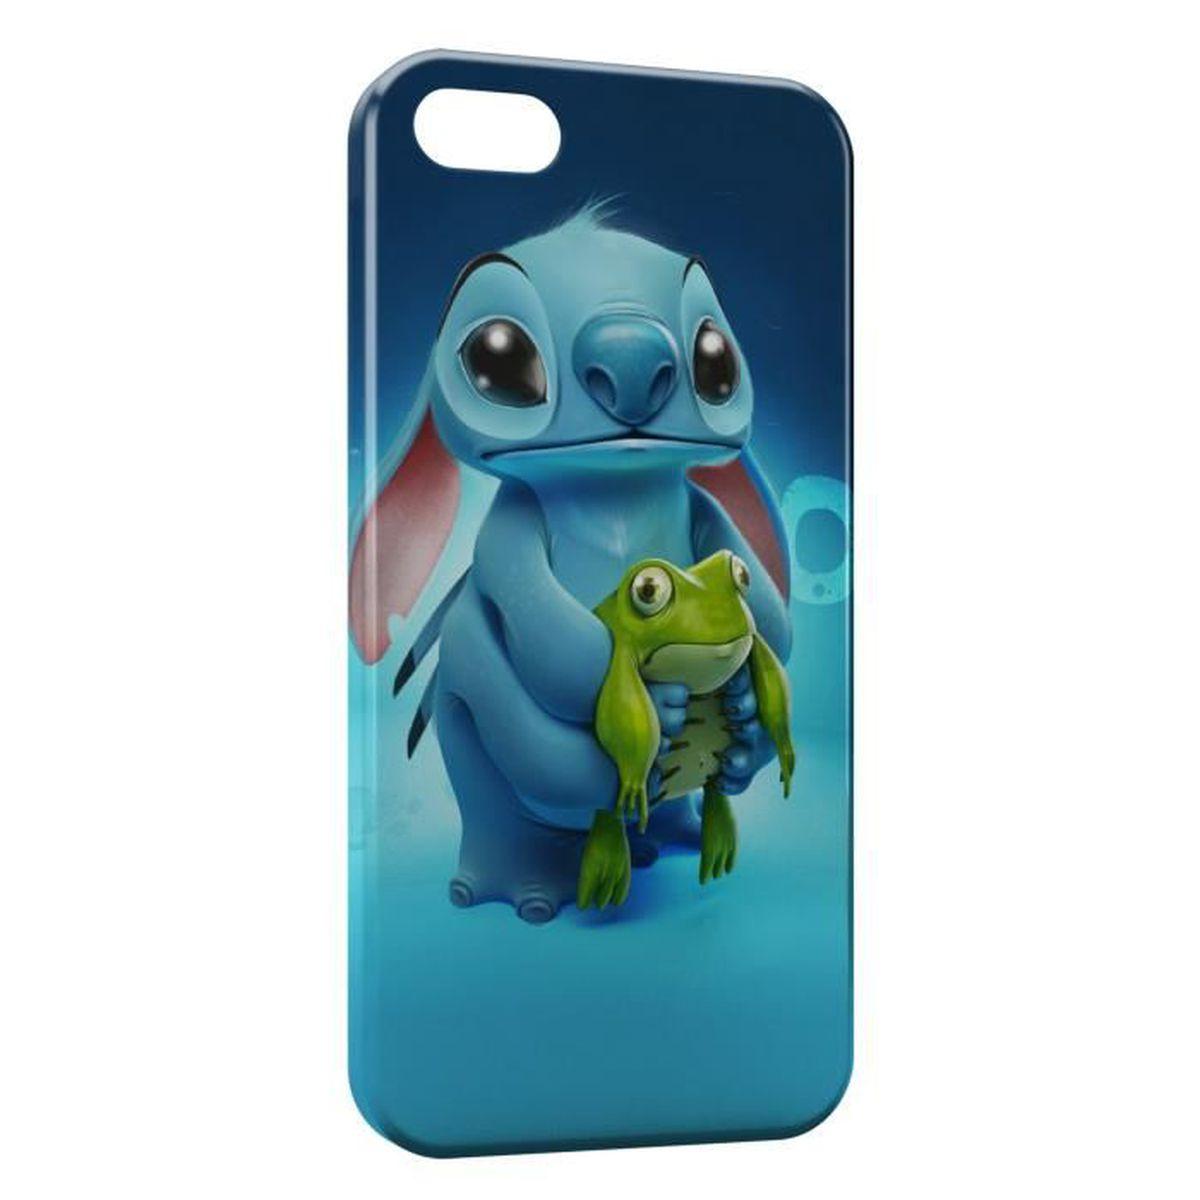 Coque iPhone 5 & 5S Stitch Grenouille 2 - Cdiscount Téléphonie